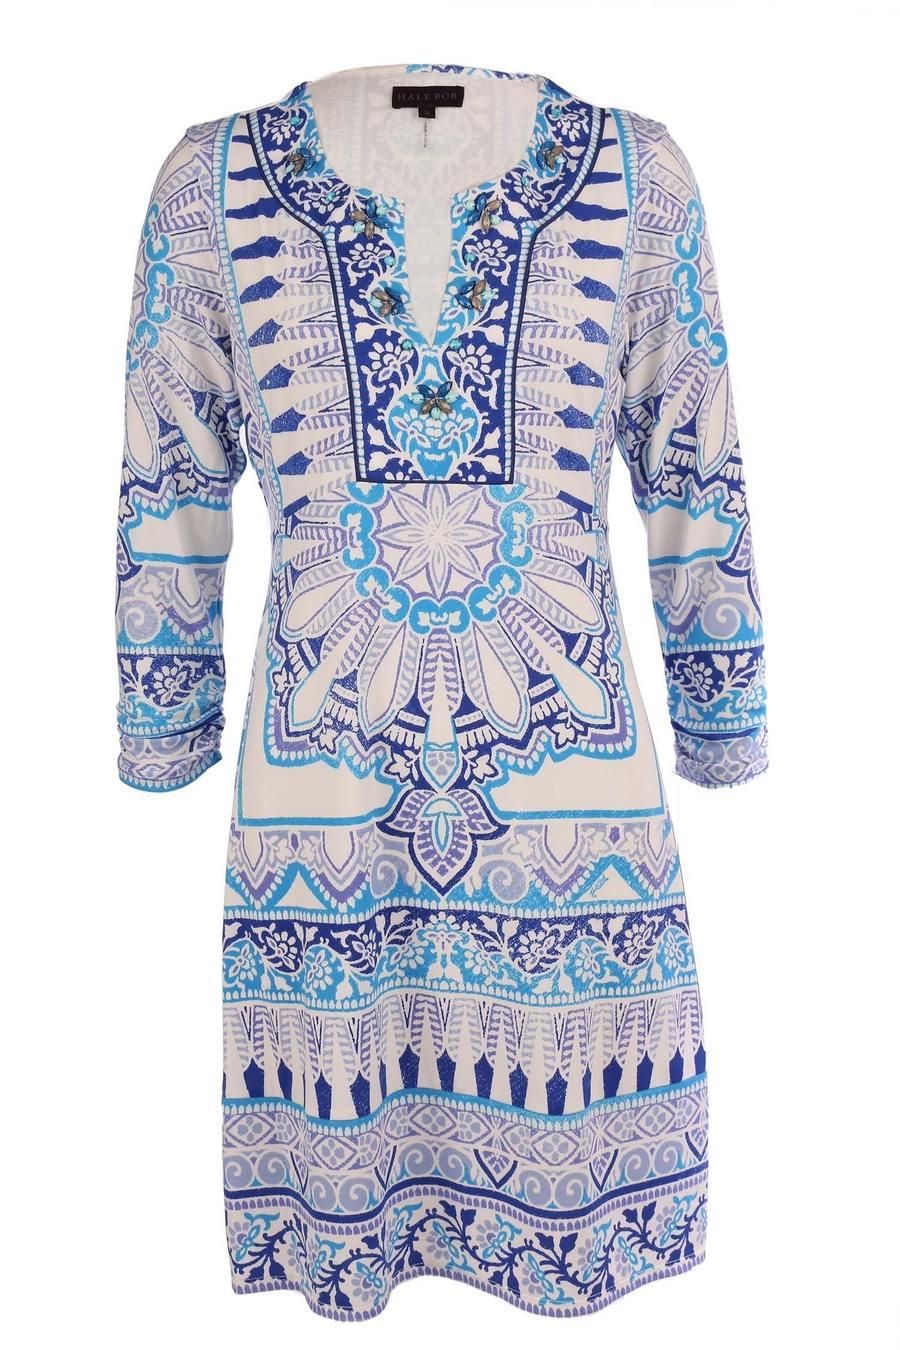 Hale Bob Marah Beaded Jersey Dress